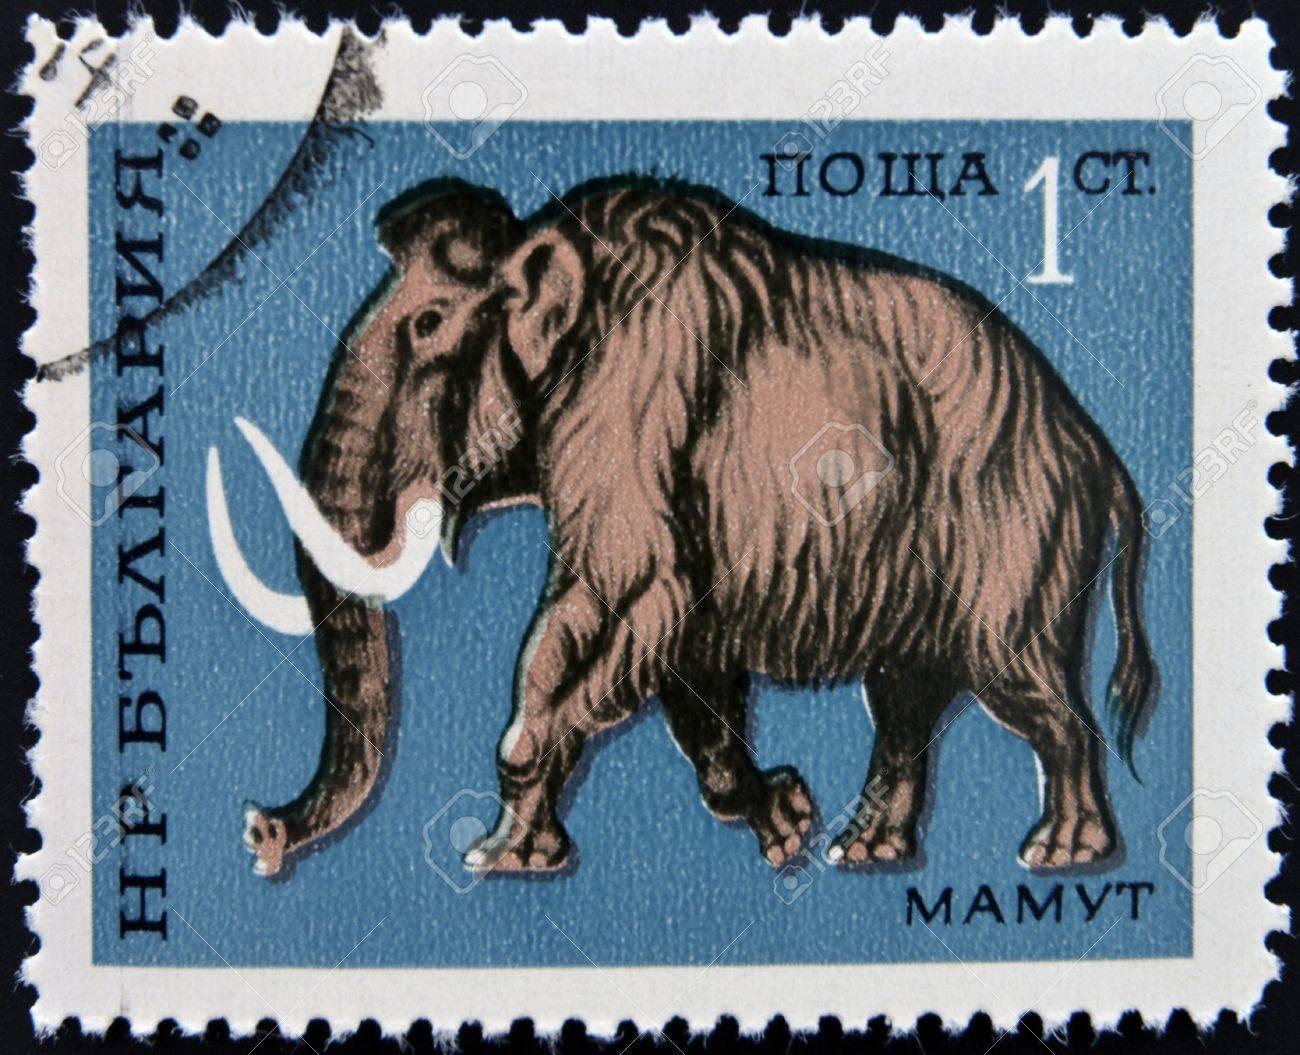 BULGARIA - CIRCA 1971  a stamp printed by BULGARIA shows mammoth, circa 1971 Stock Photo - 13026369